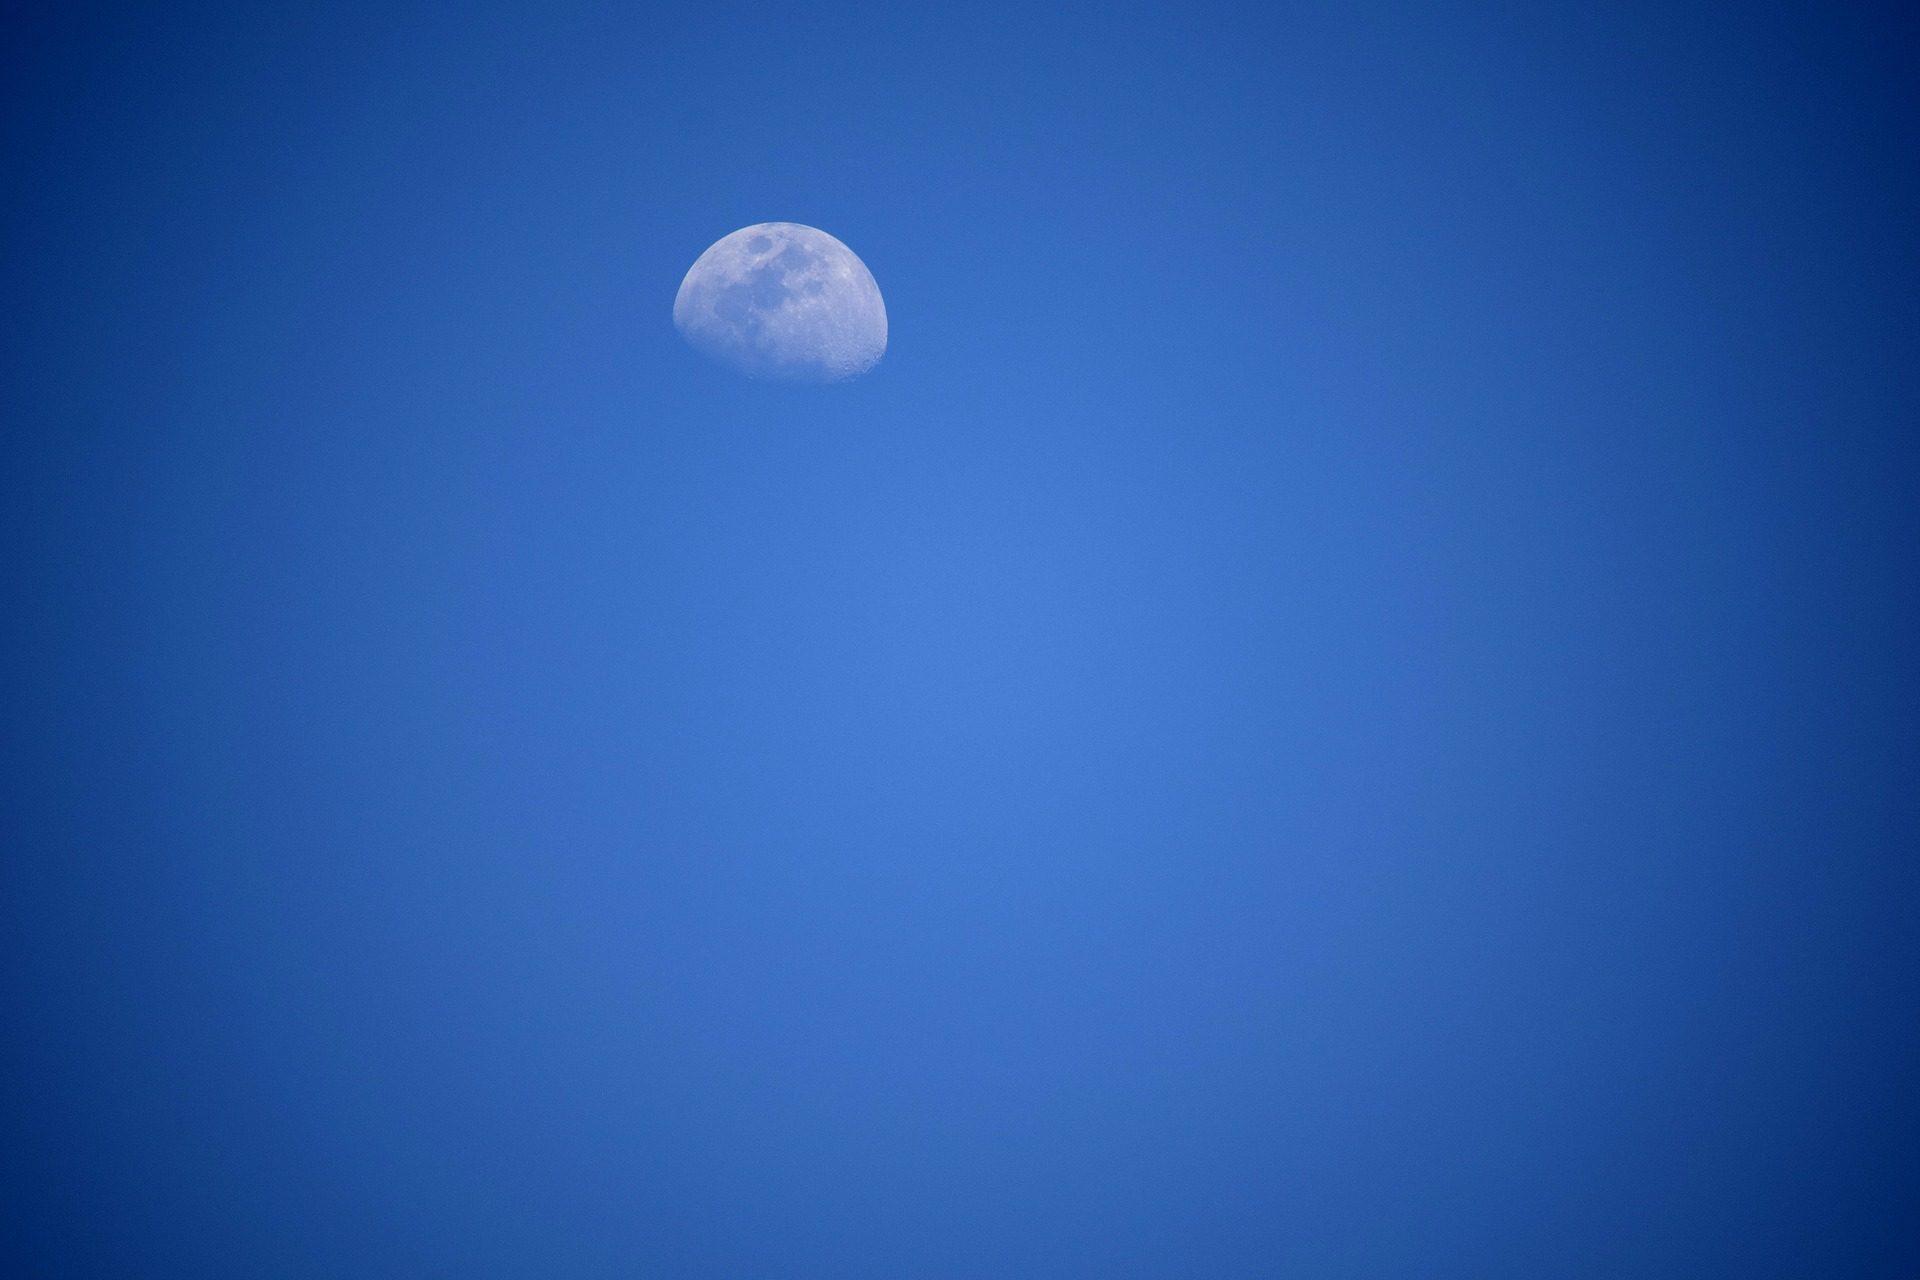 Mond, Himmel, Satellit, Blau, Entfernung, Raum - Wallpaper HD - Prof.-falken.com